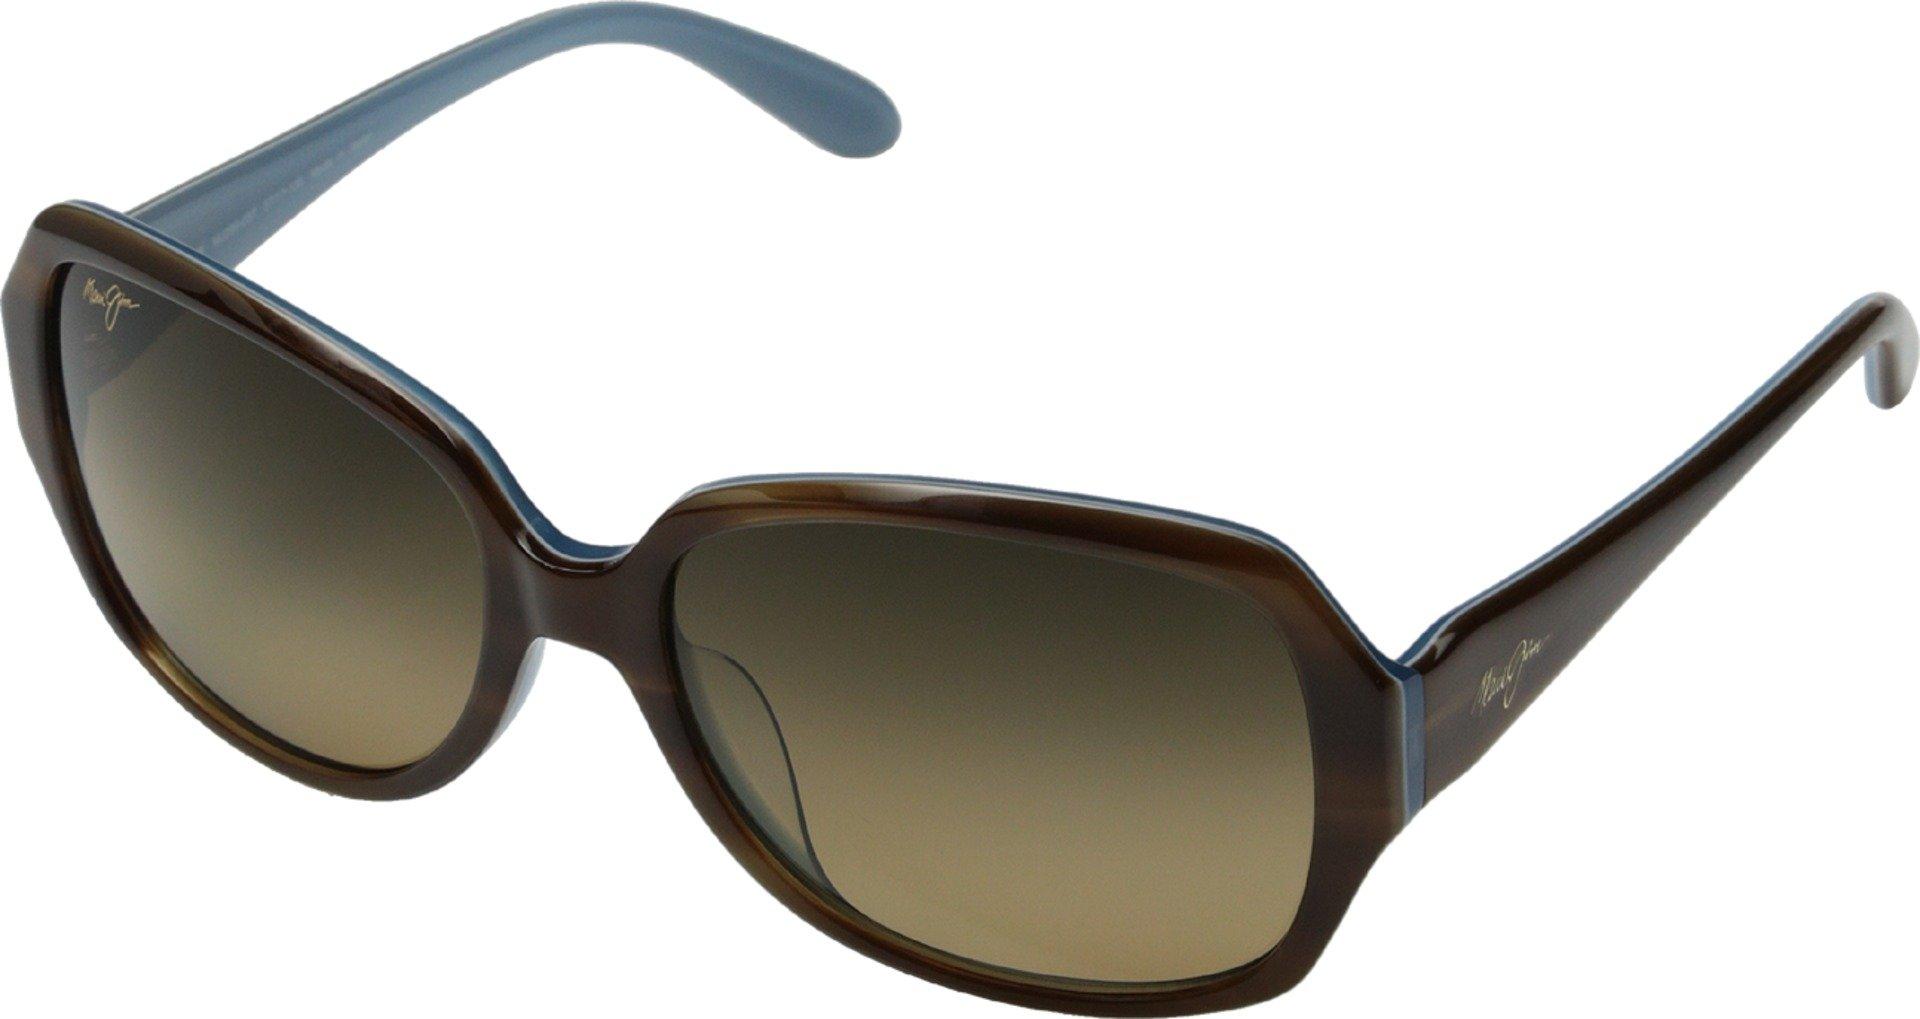 Maui Jim Womens Kalena 57 Sunglasses (299) Brown/Bronze Acetate - Polarized - 57mm